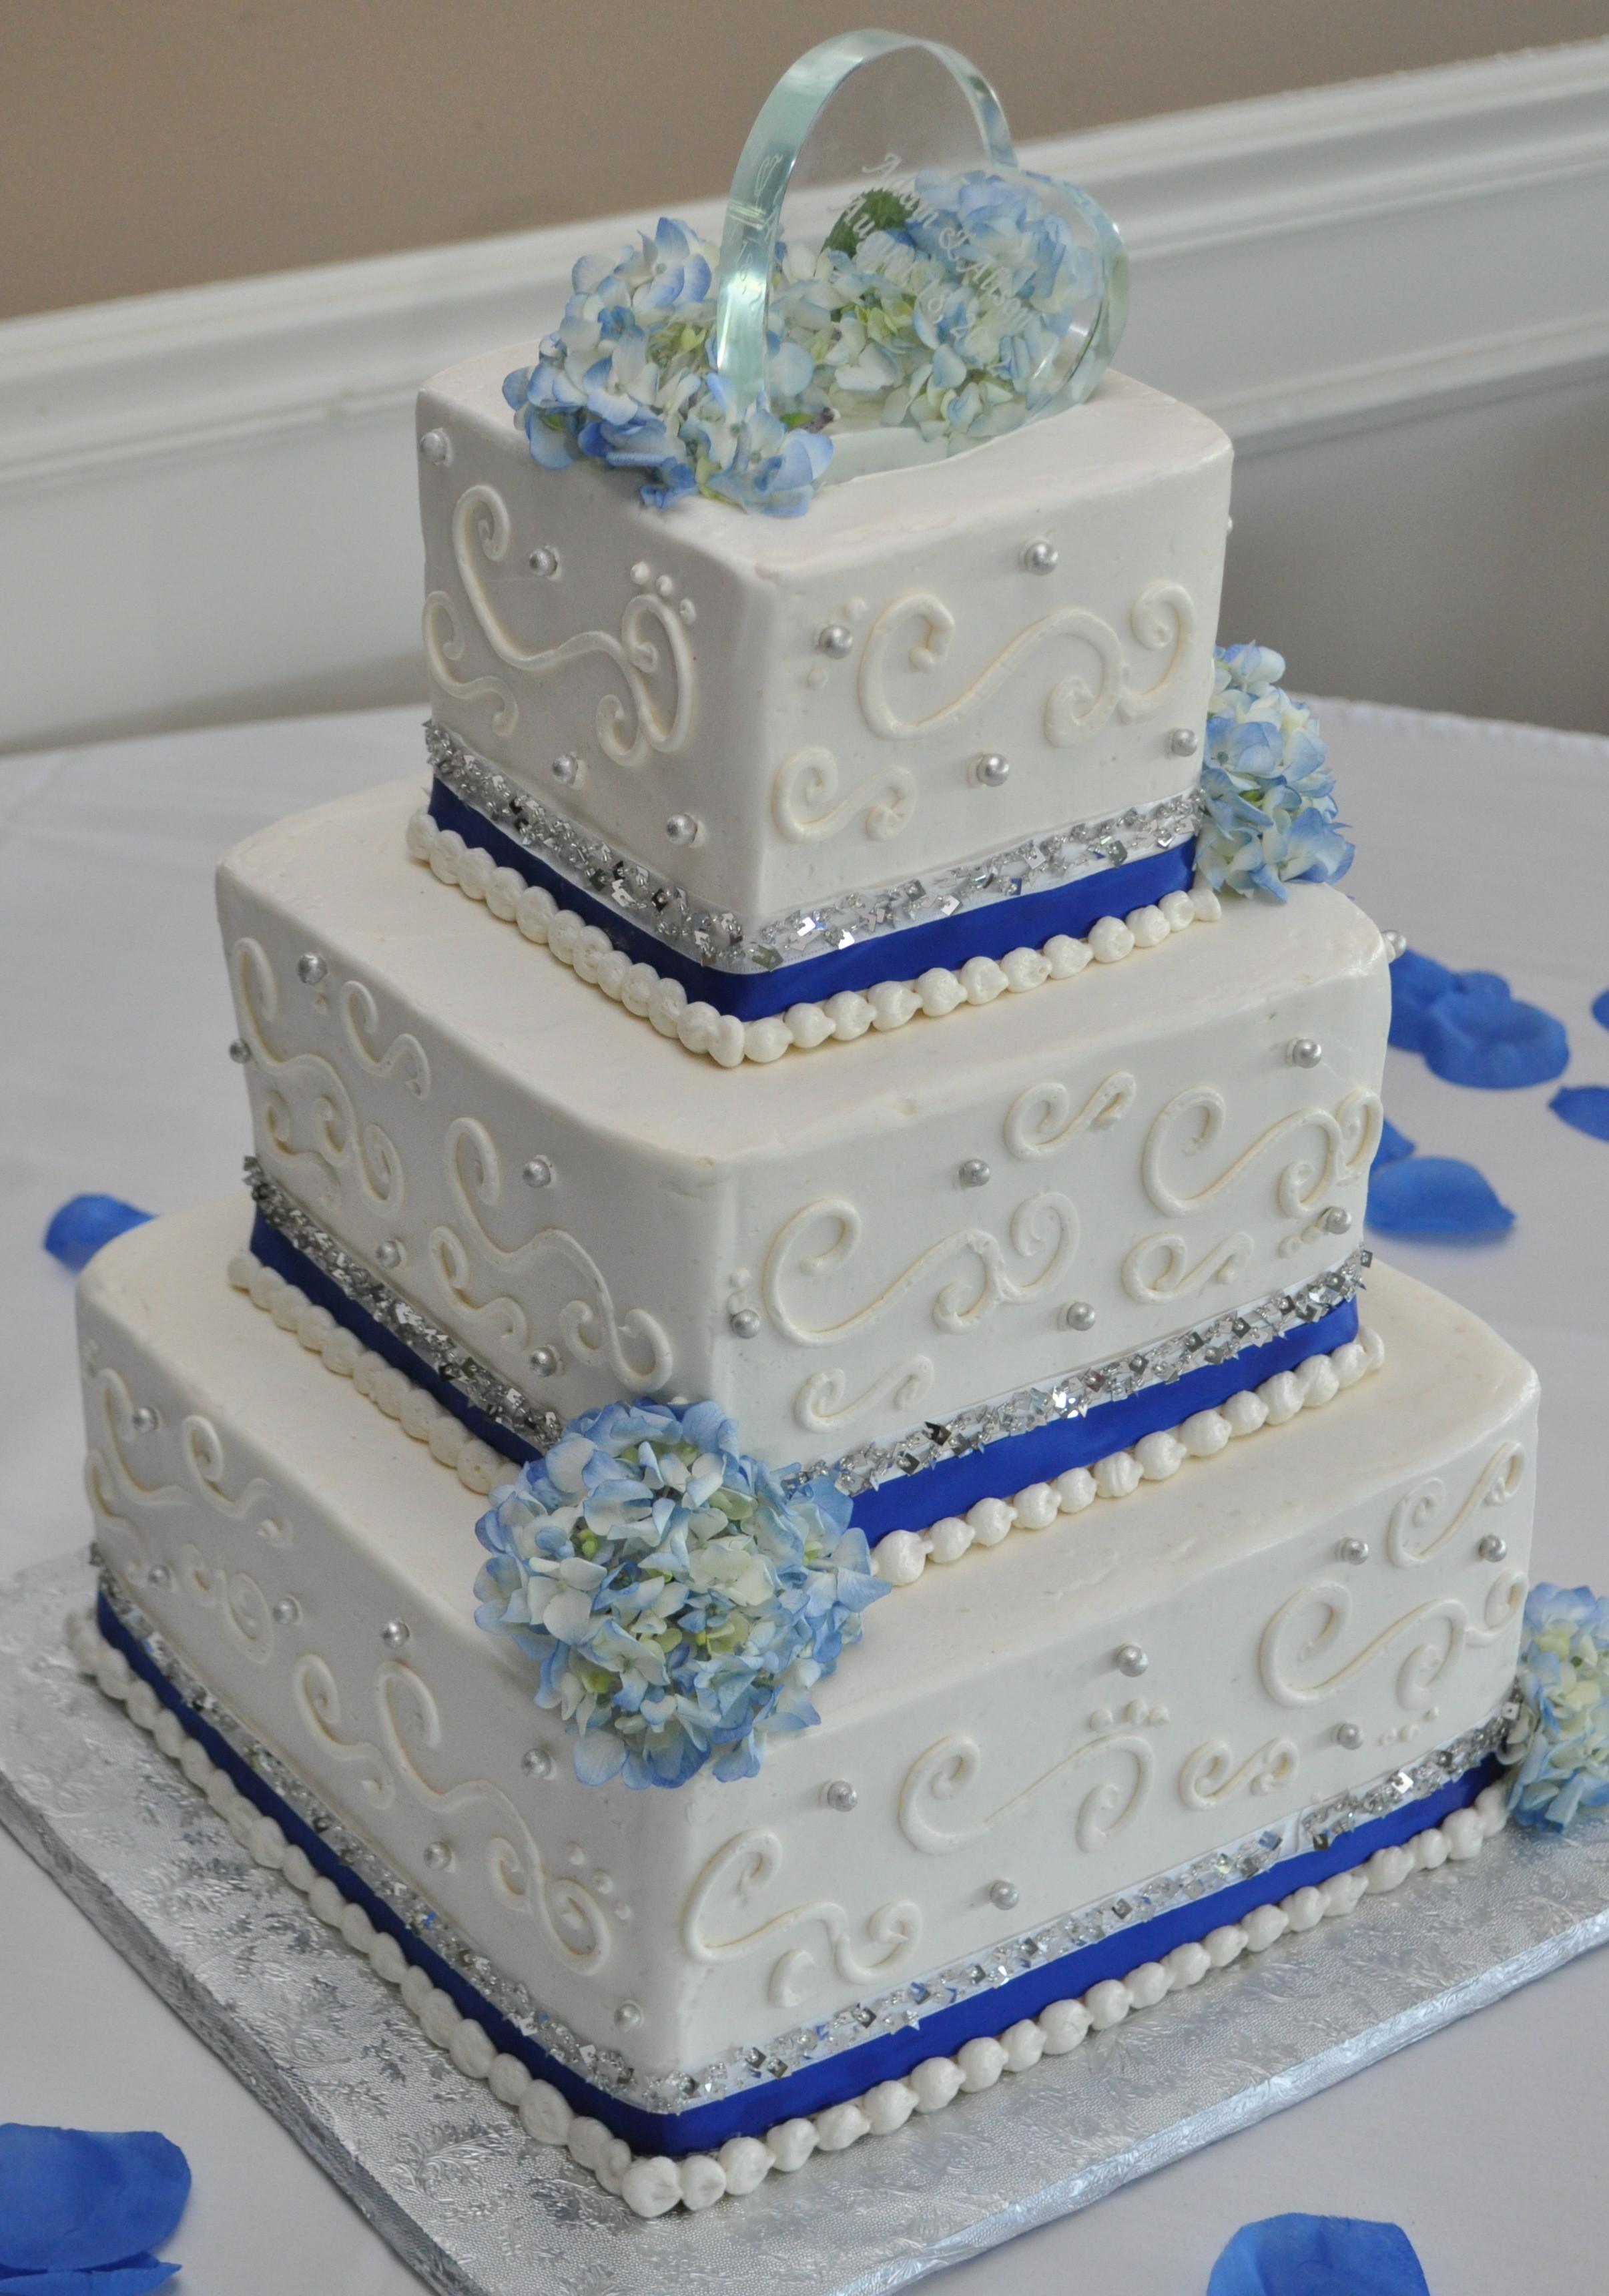 Pinterest Wedding Cakes  Silver wedding cakes pinterest idea in 2017